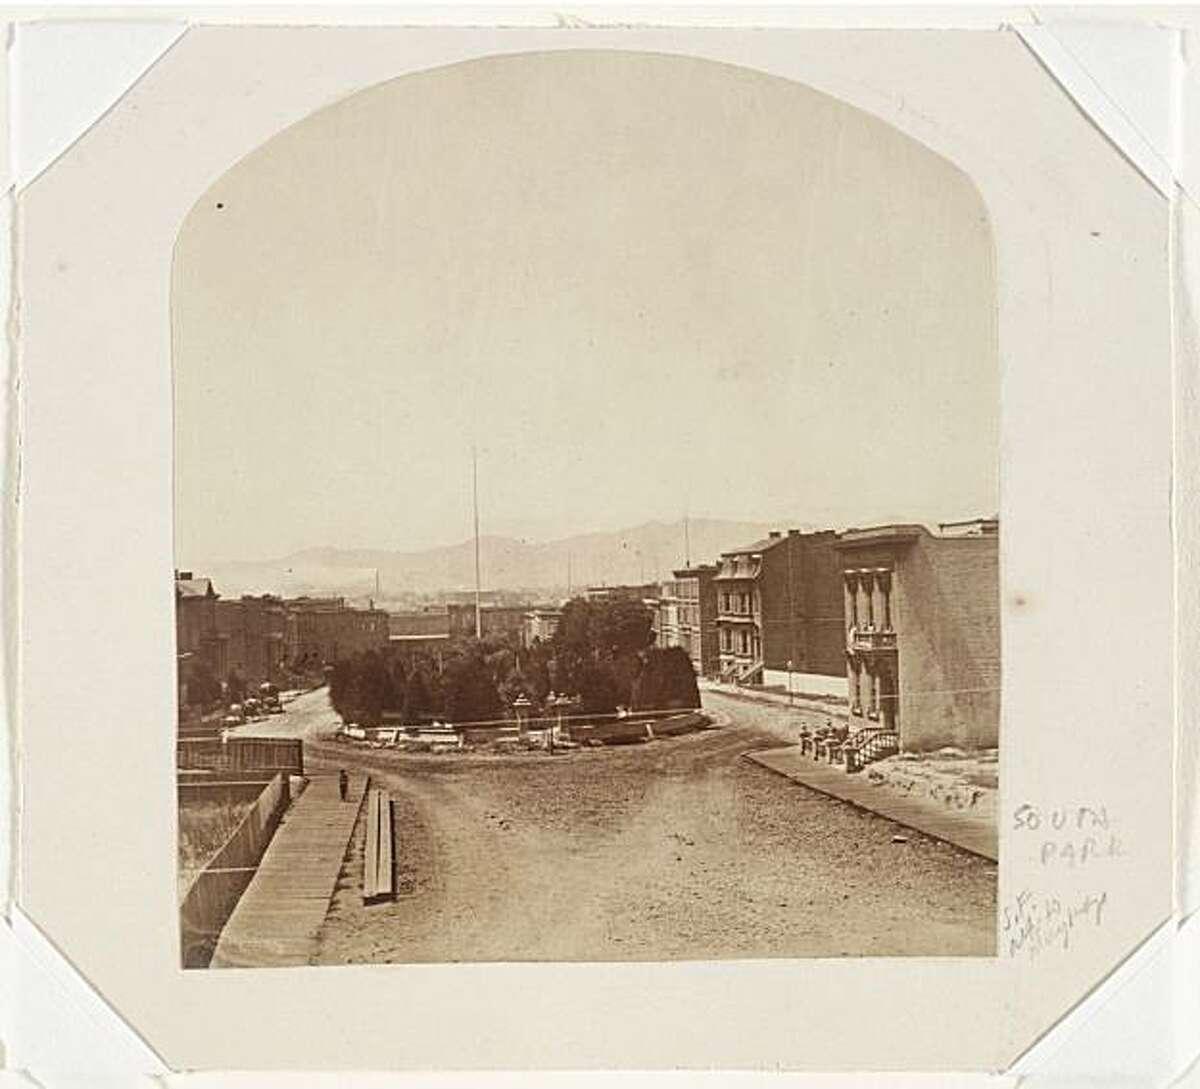 View of South Park, San Francisco, ca. 1873.